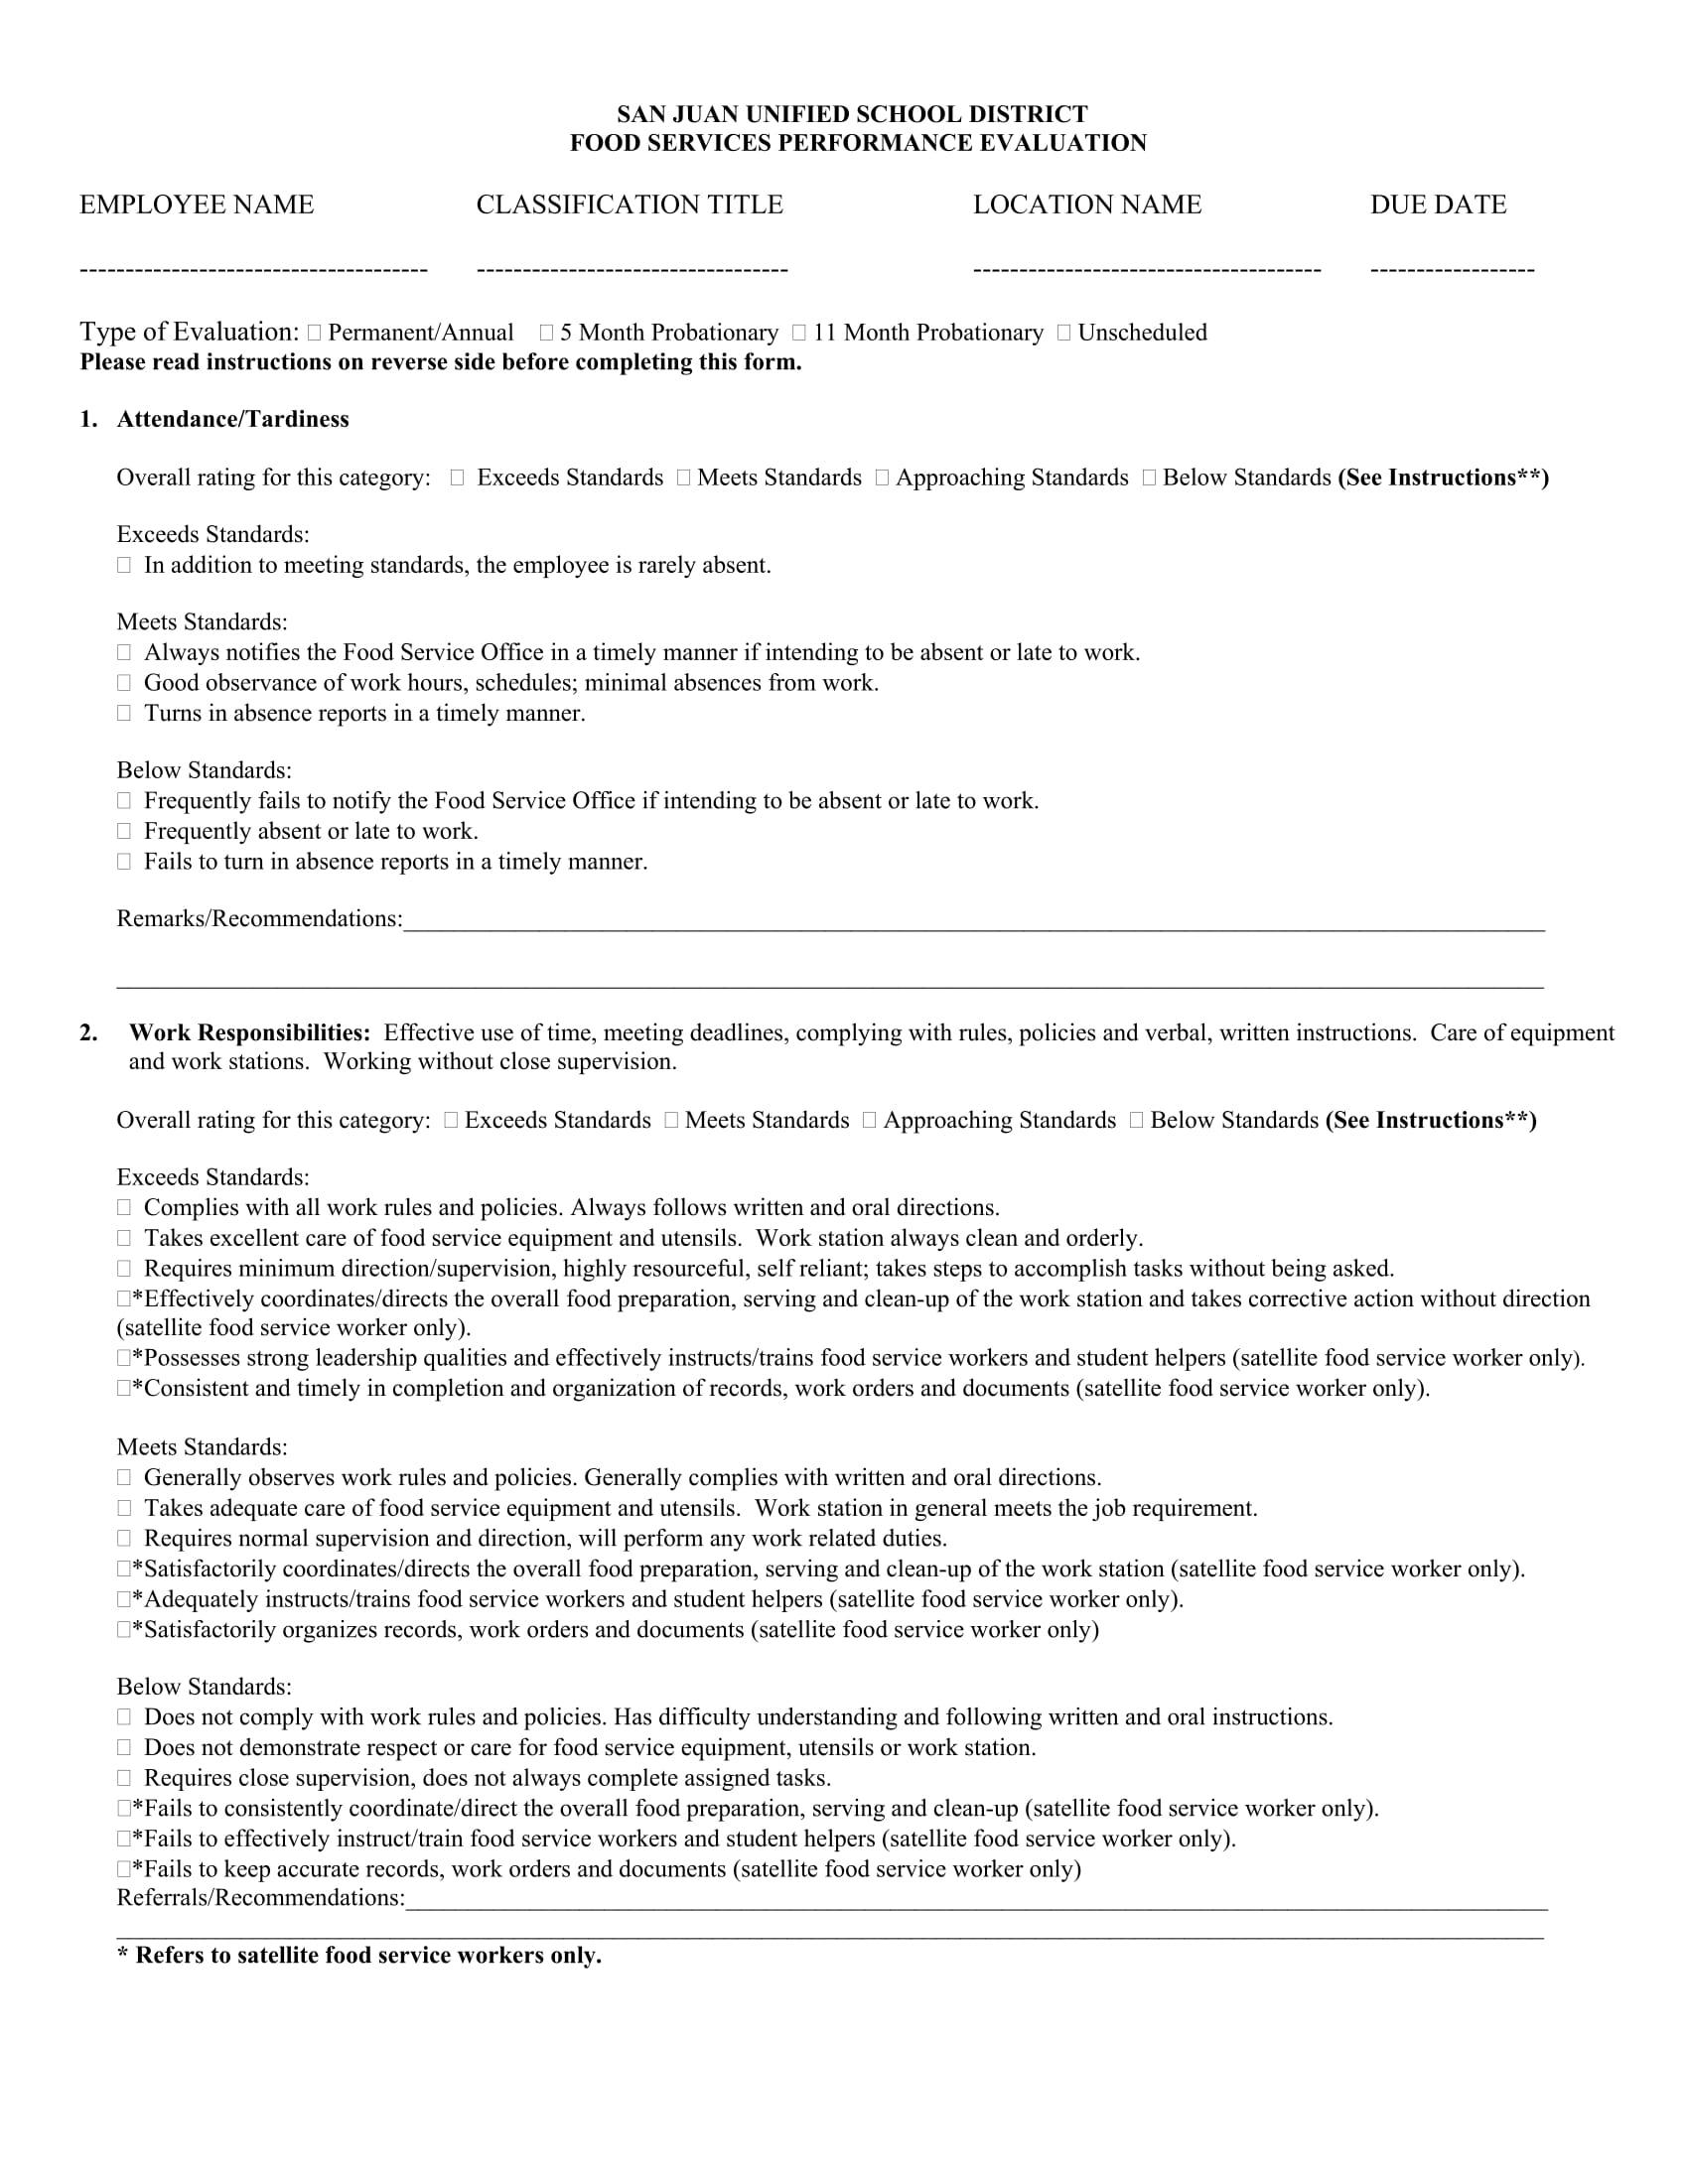 school food service performance evaluation form 1